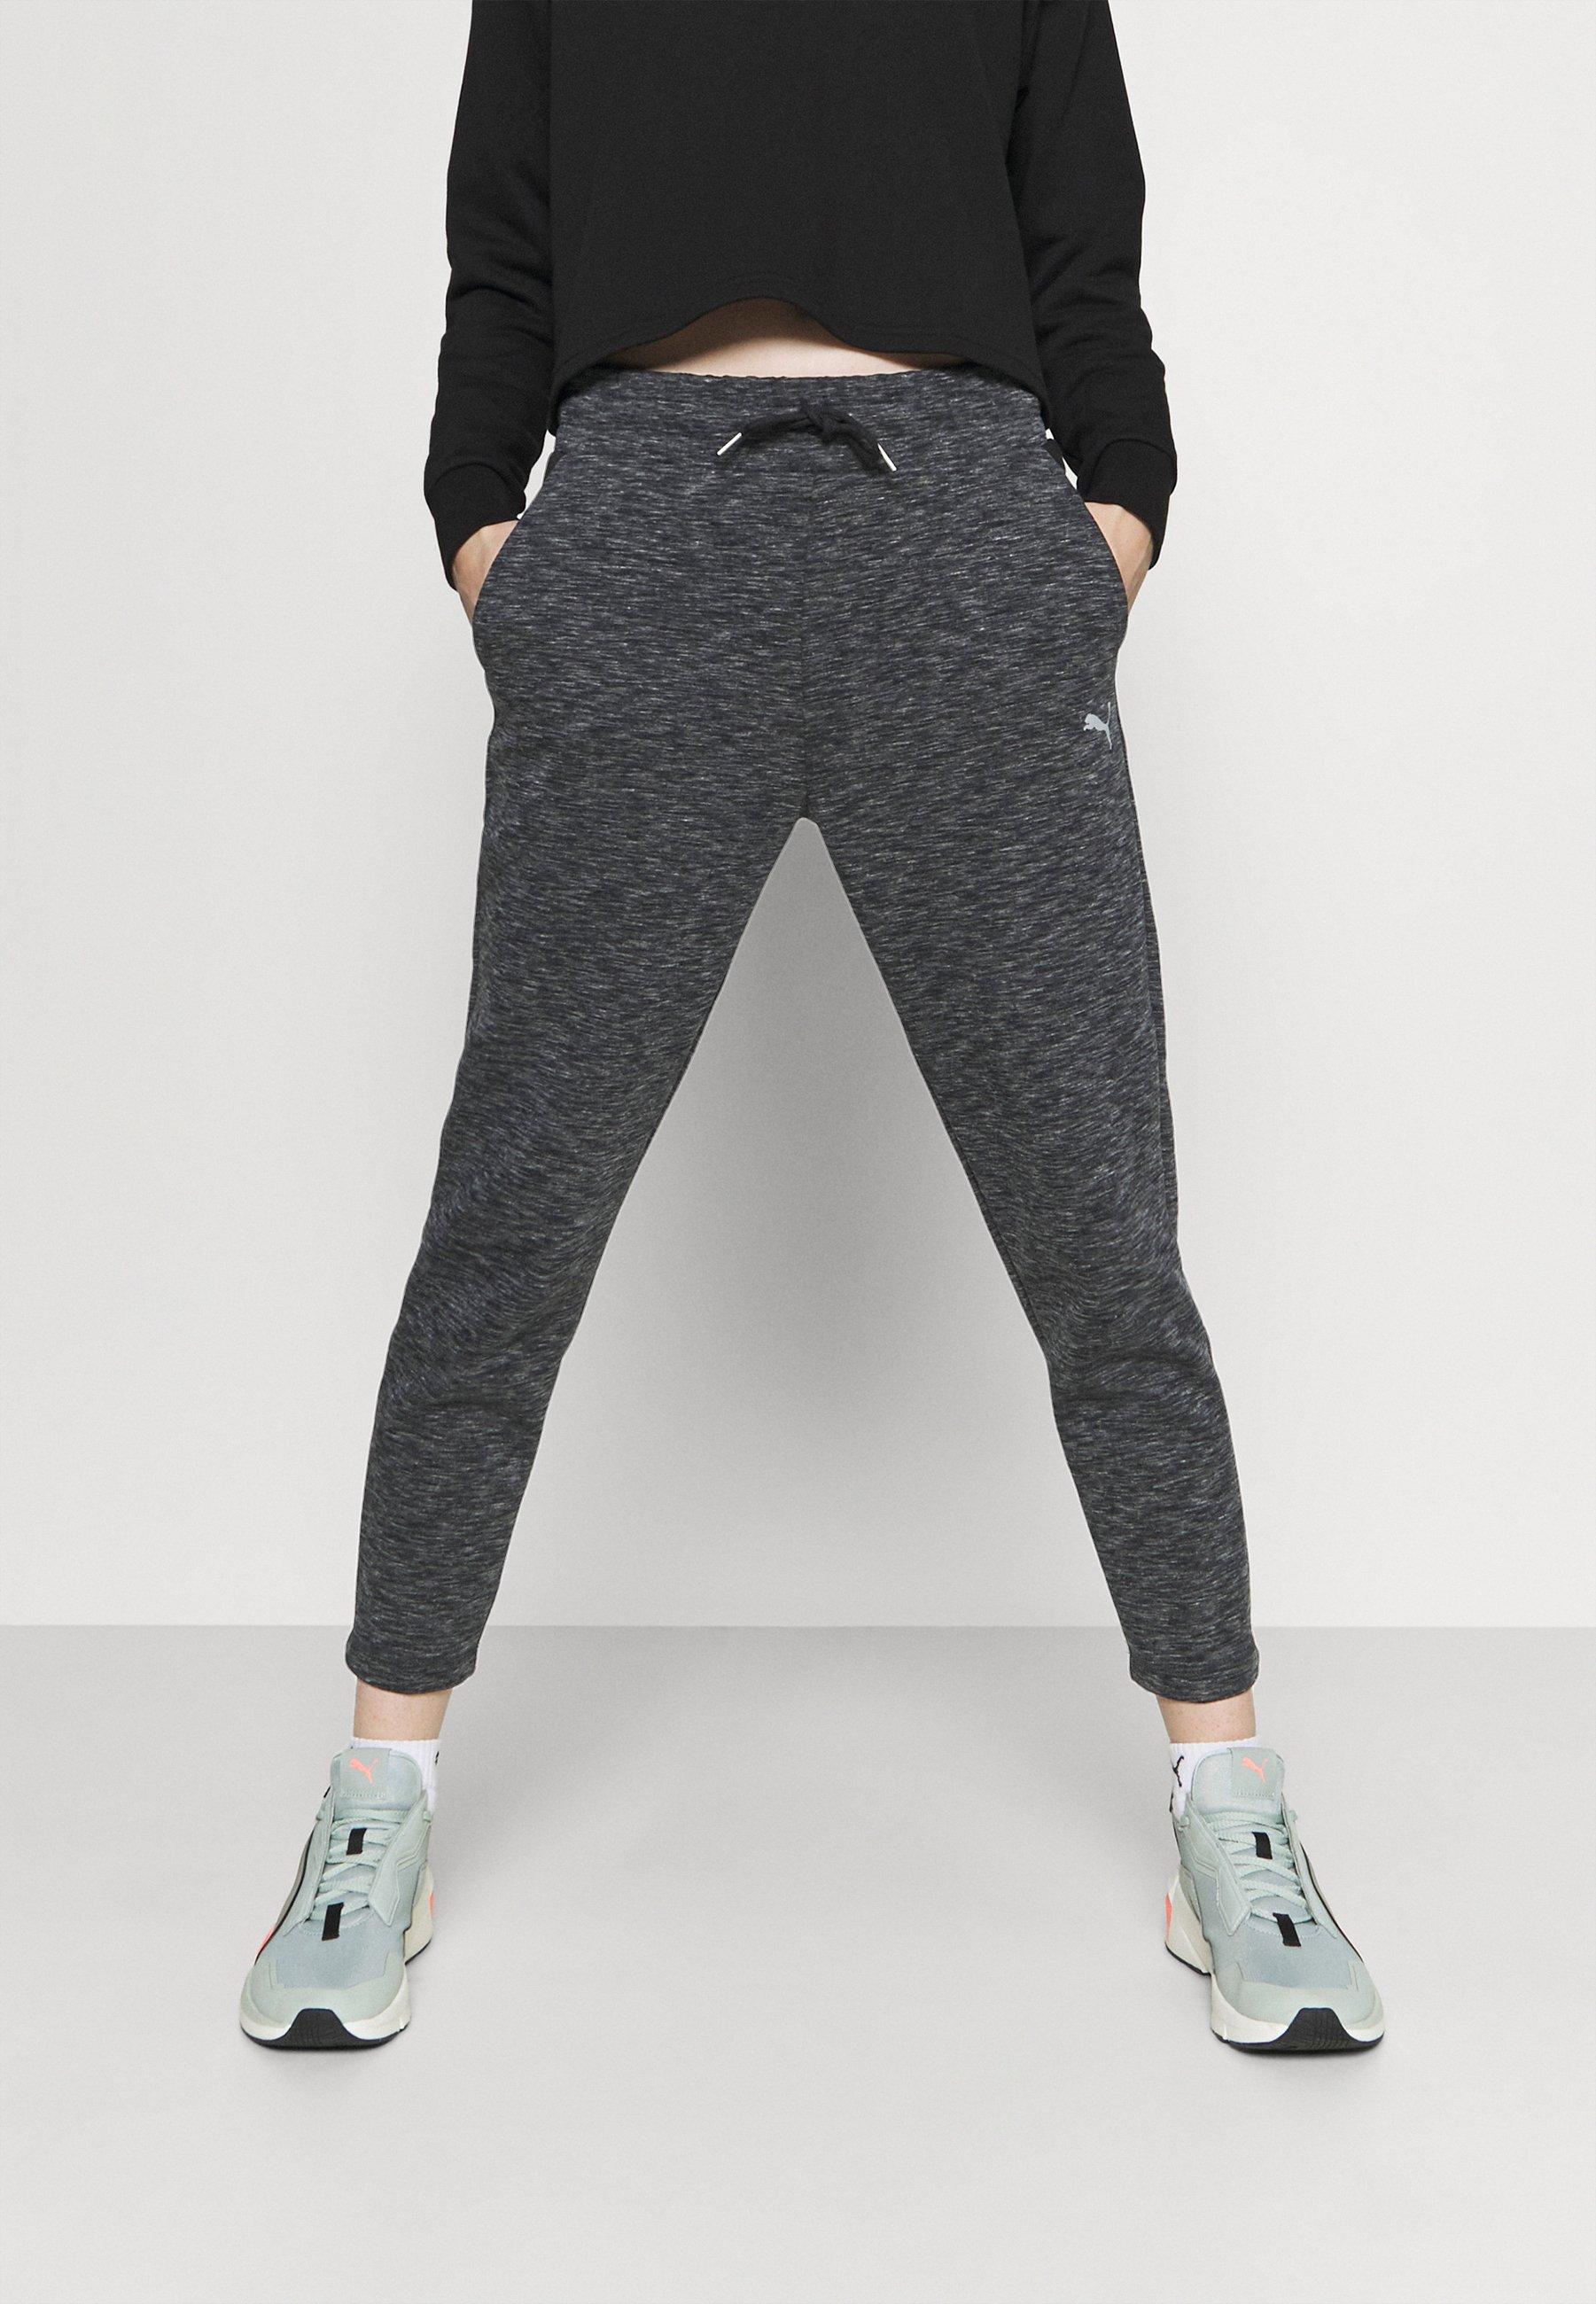 Femme EVOSTRIPE PANTS - Pantalon de survêtement